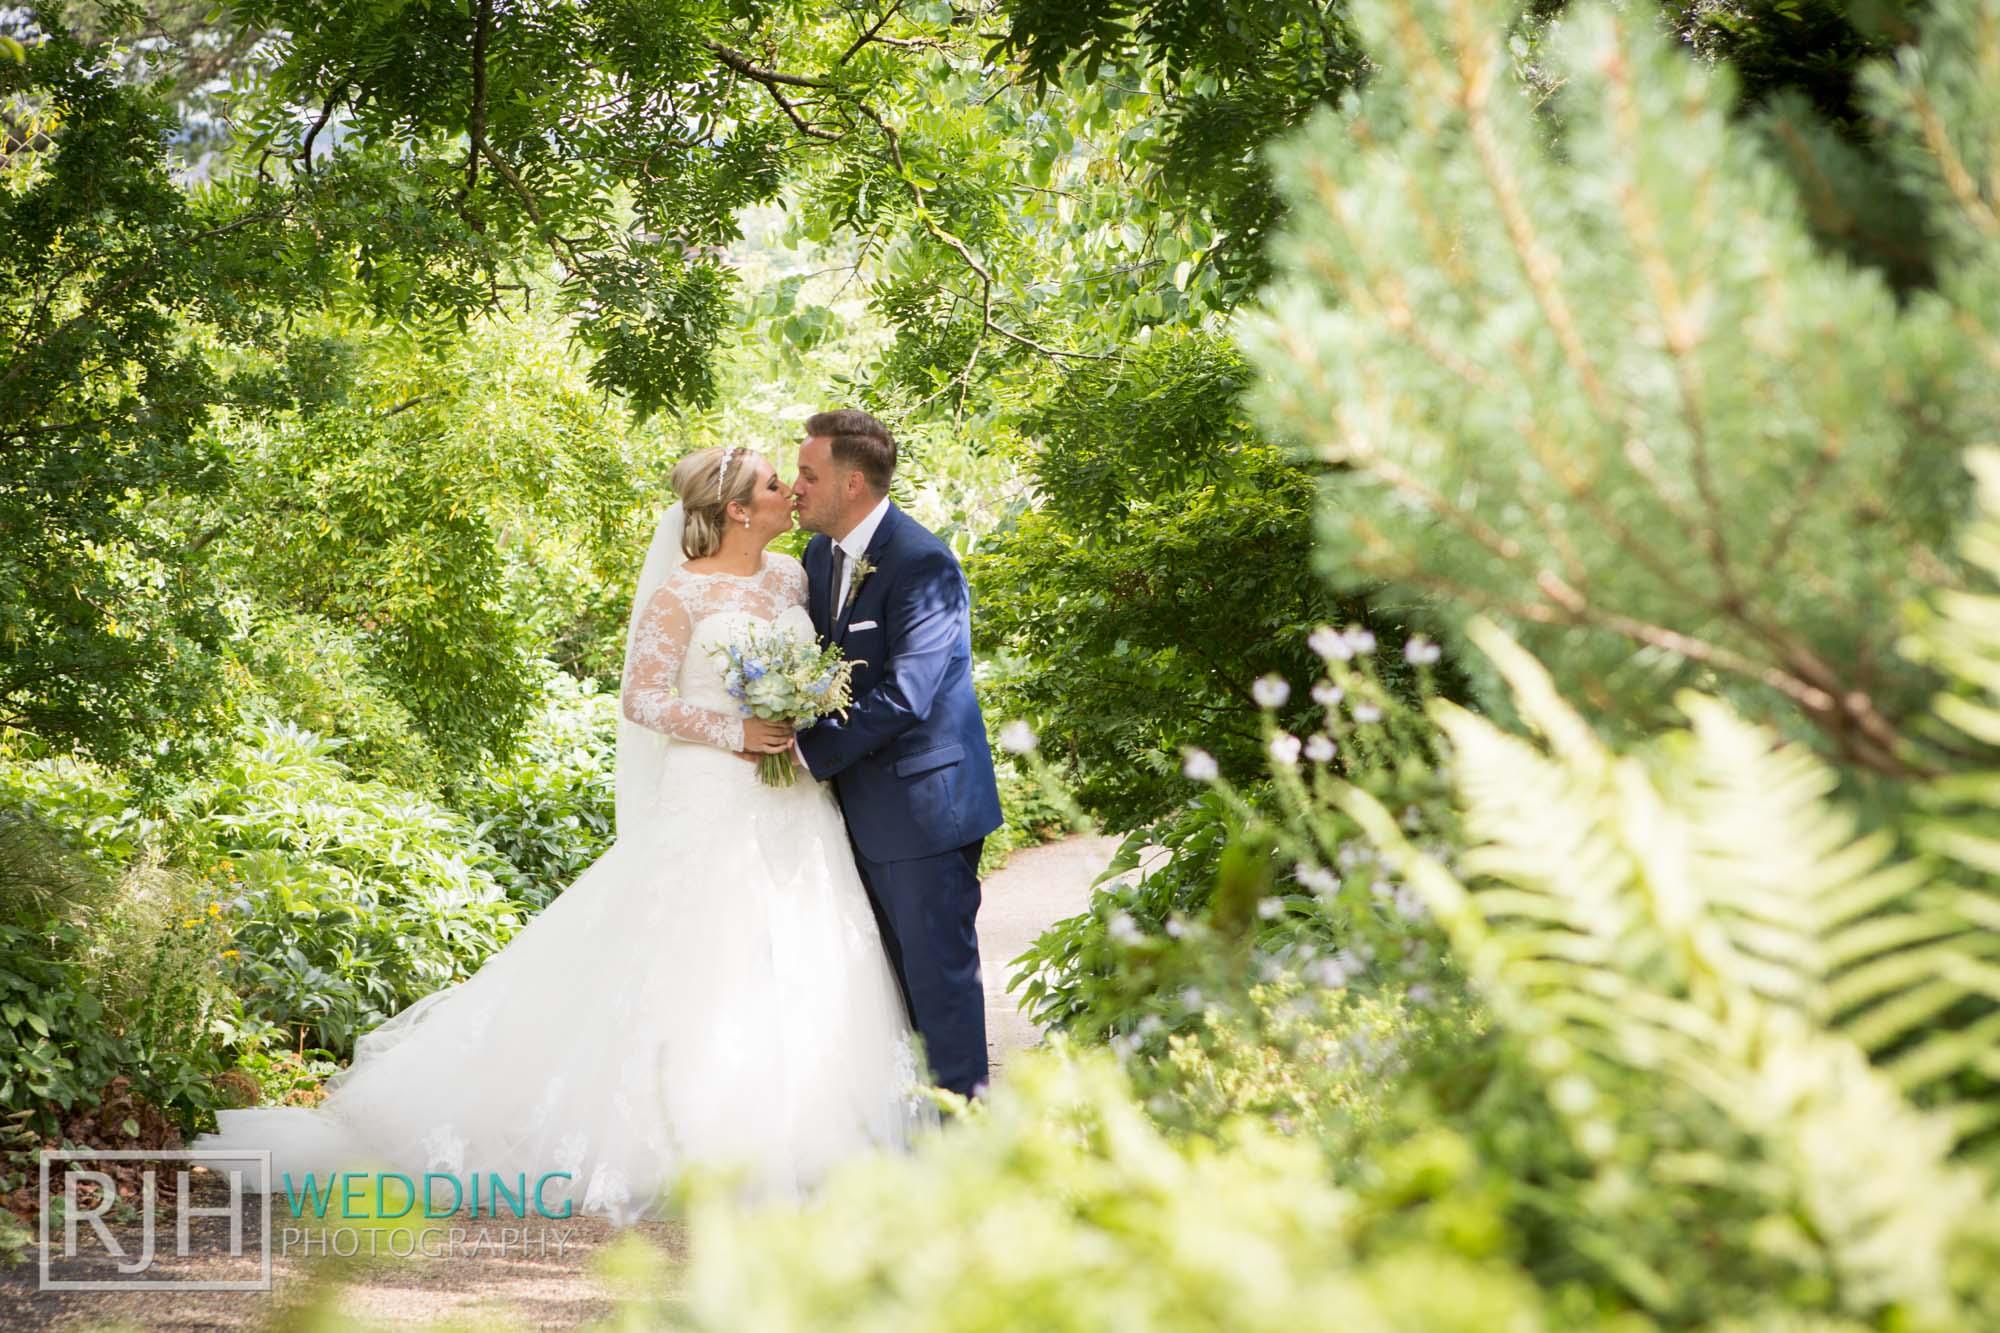 Baldwins Omega Watson Wedding_219_3C2A6242.jpg